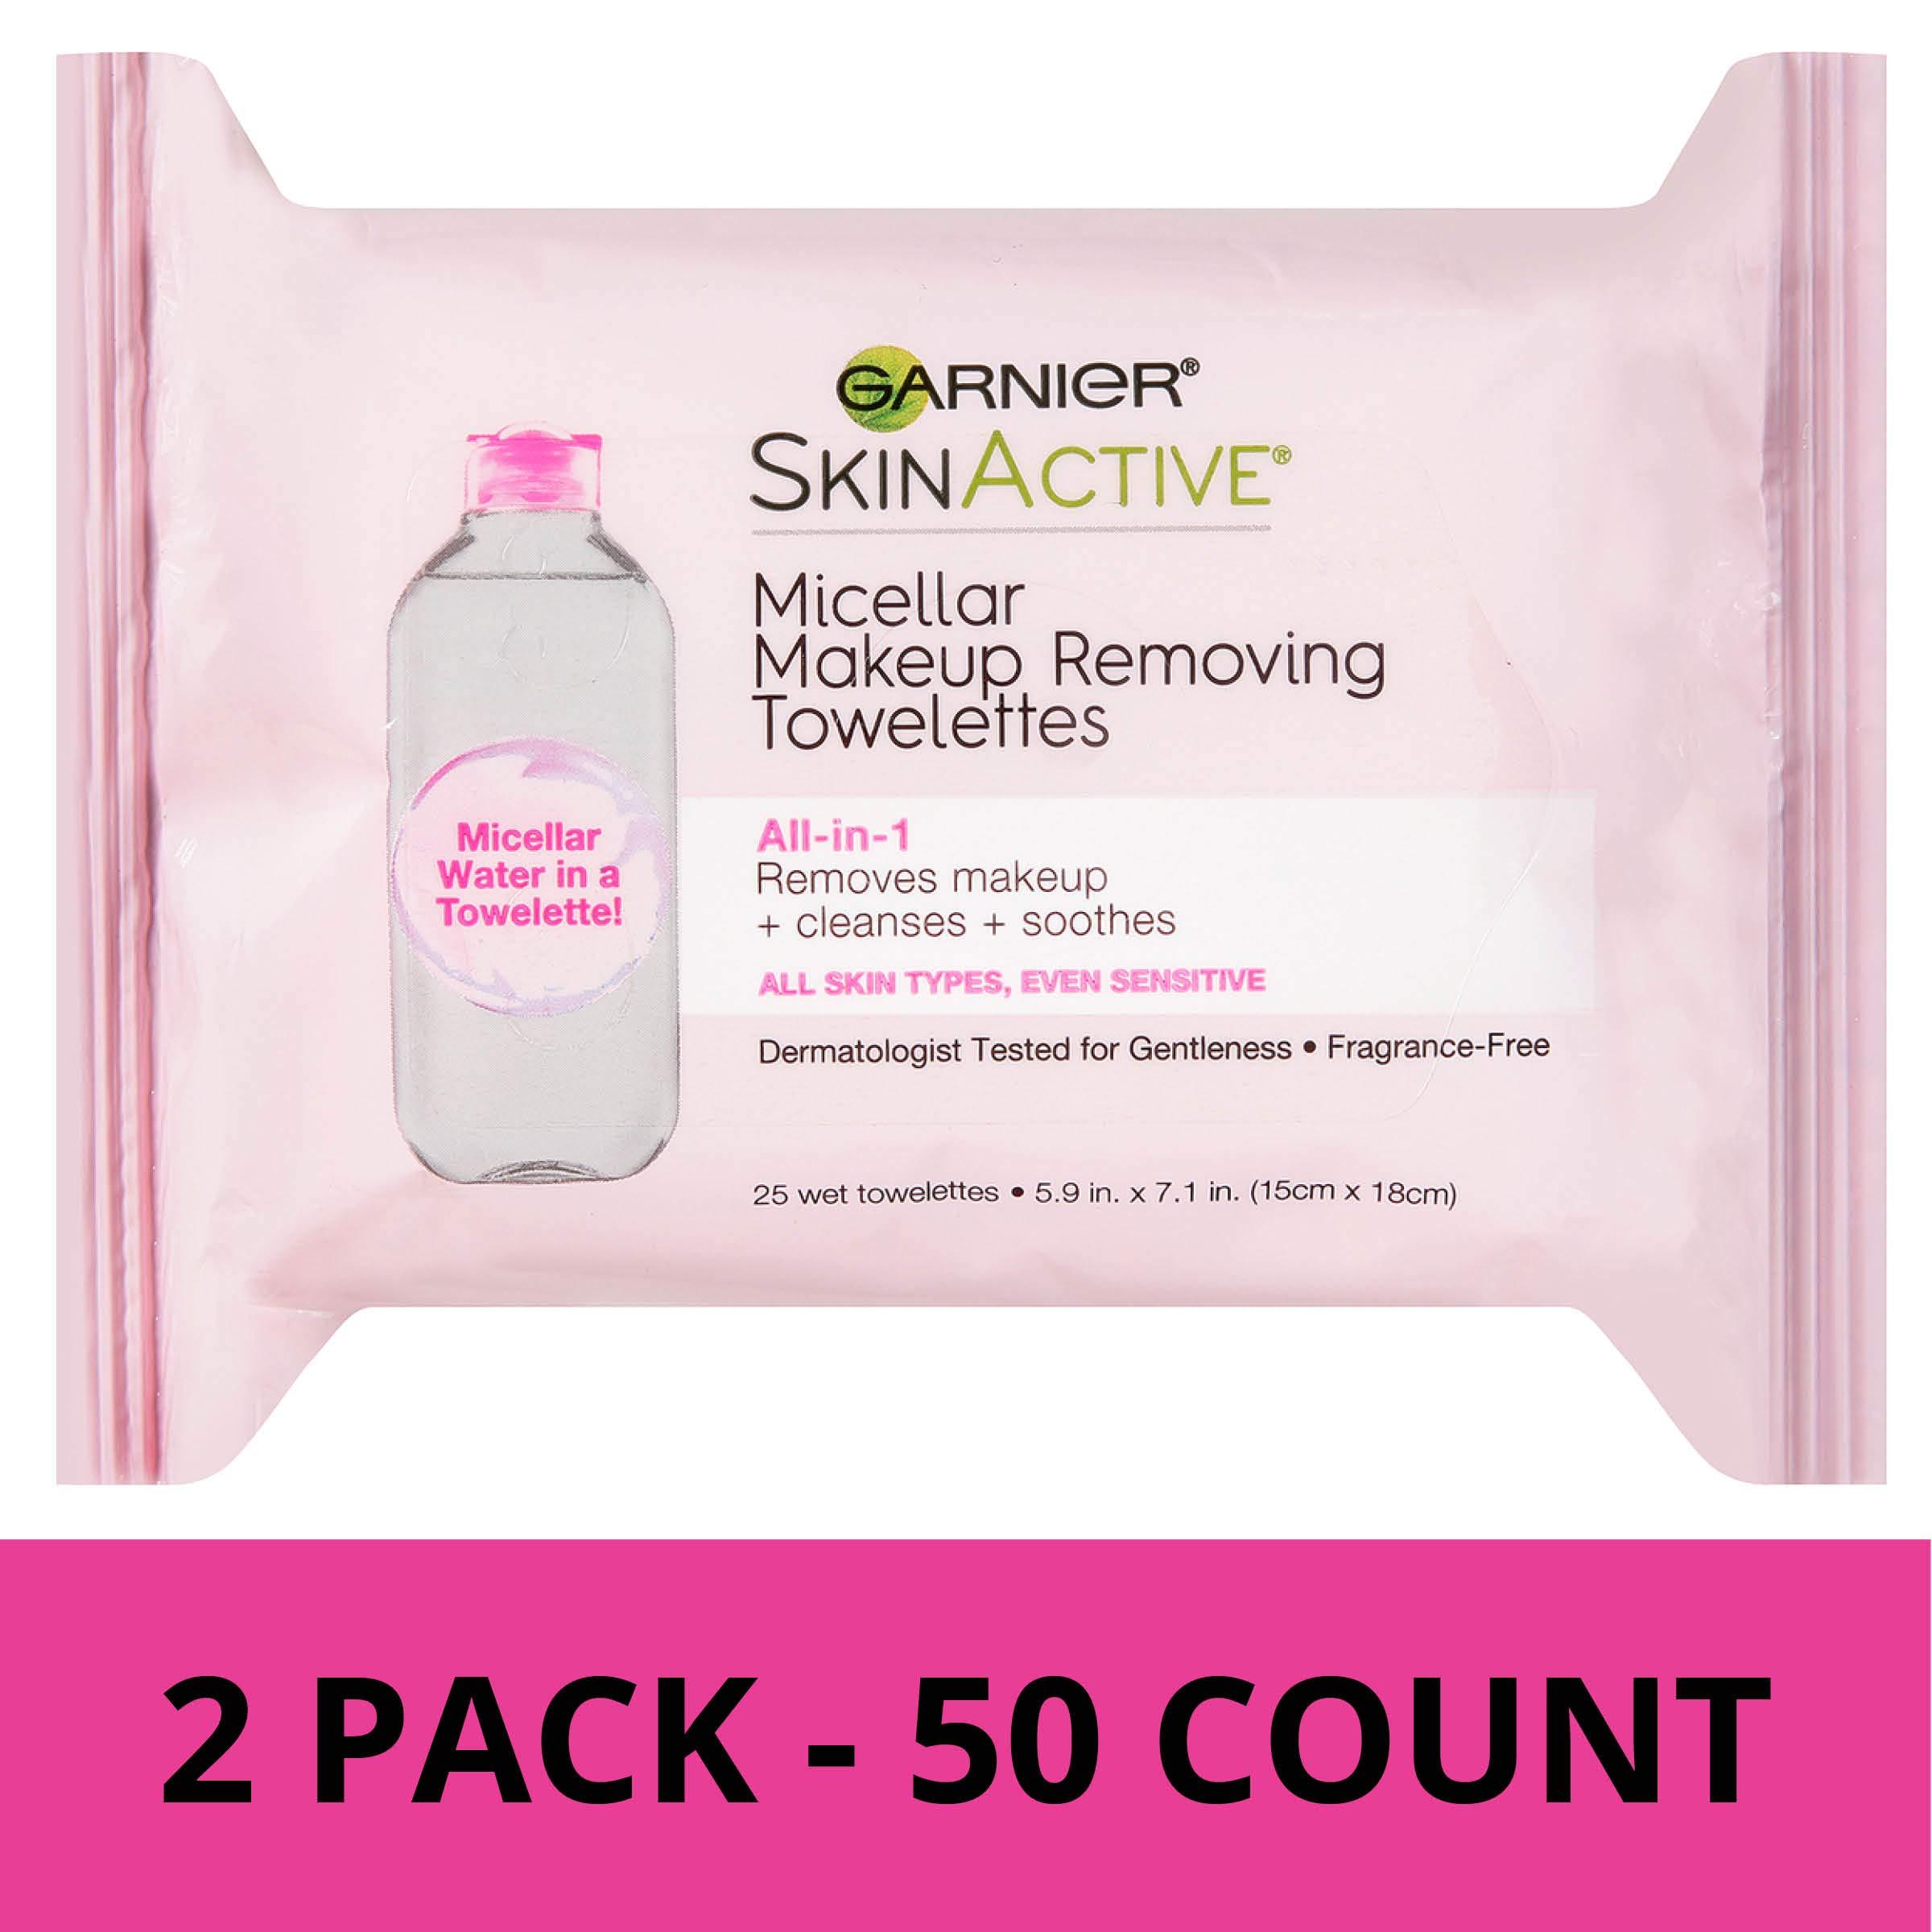 Garnier SkinActive Micellar Makeup Remover Wipes, 25 Count (Pack of 2) by Garnier